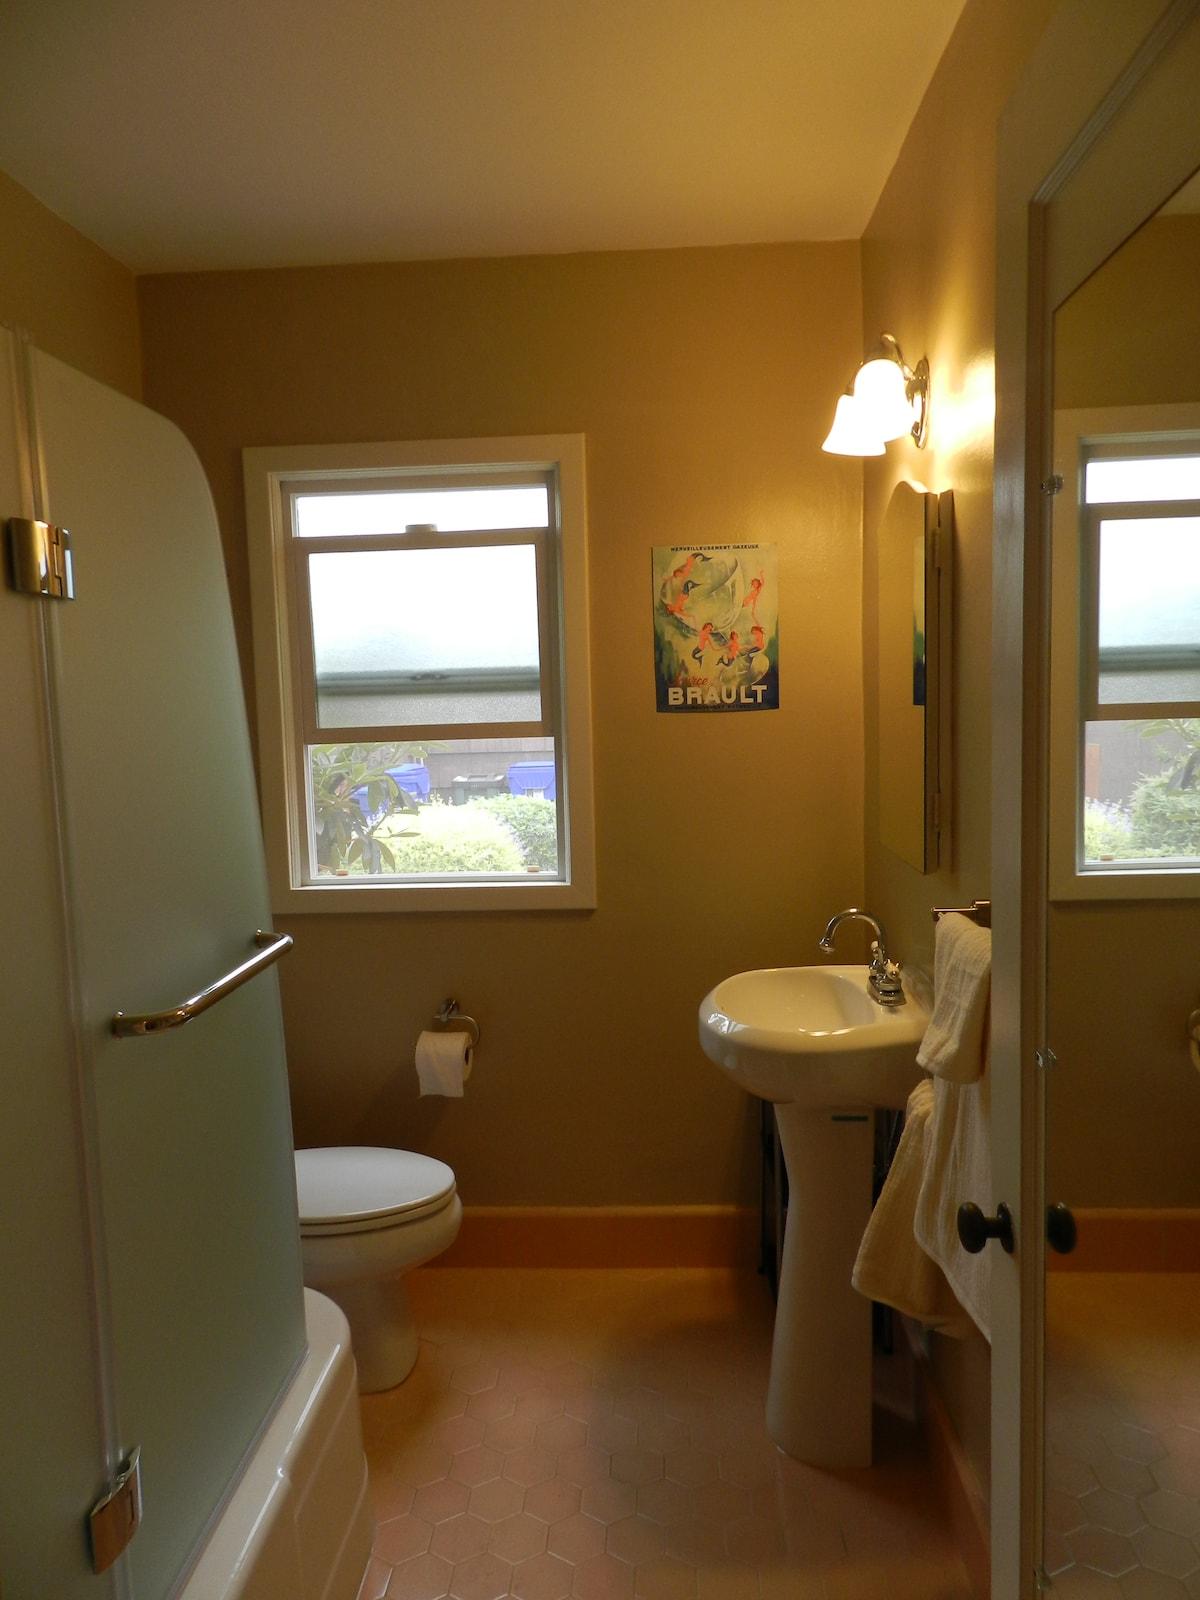 Bathroom with stylish euro shower door.